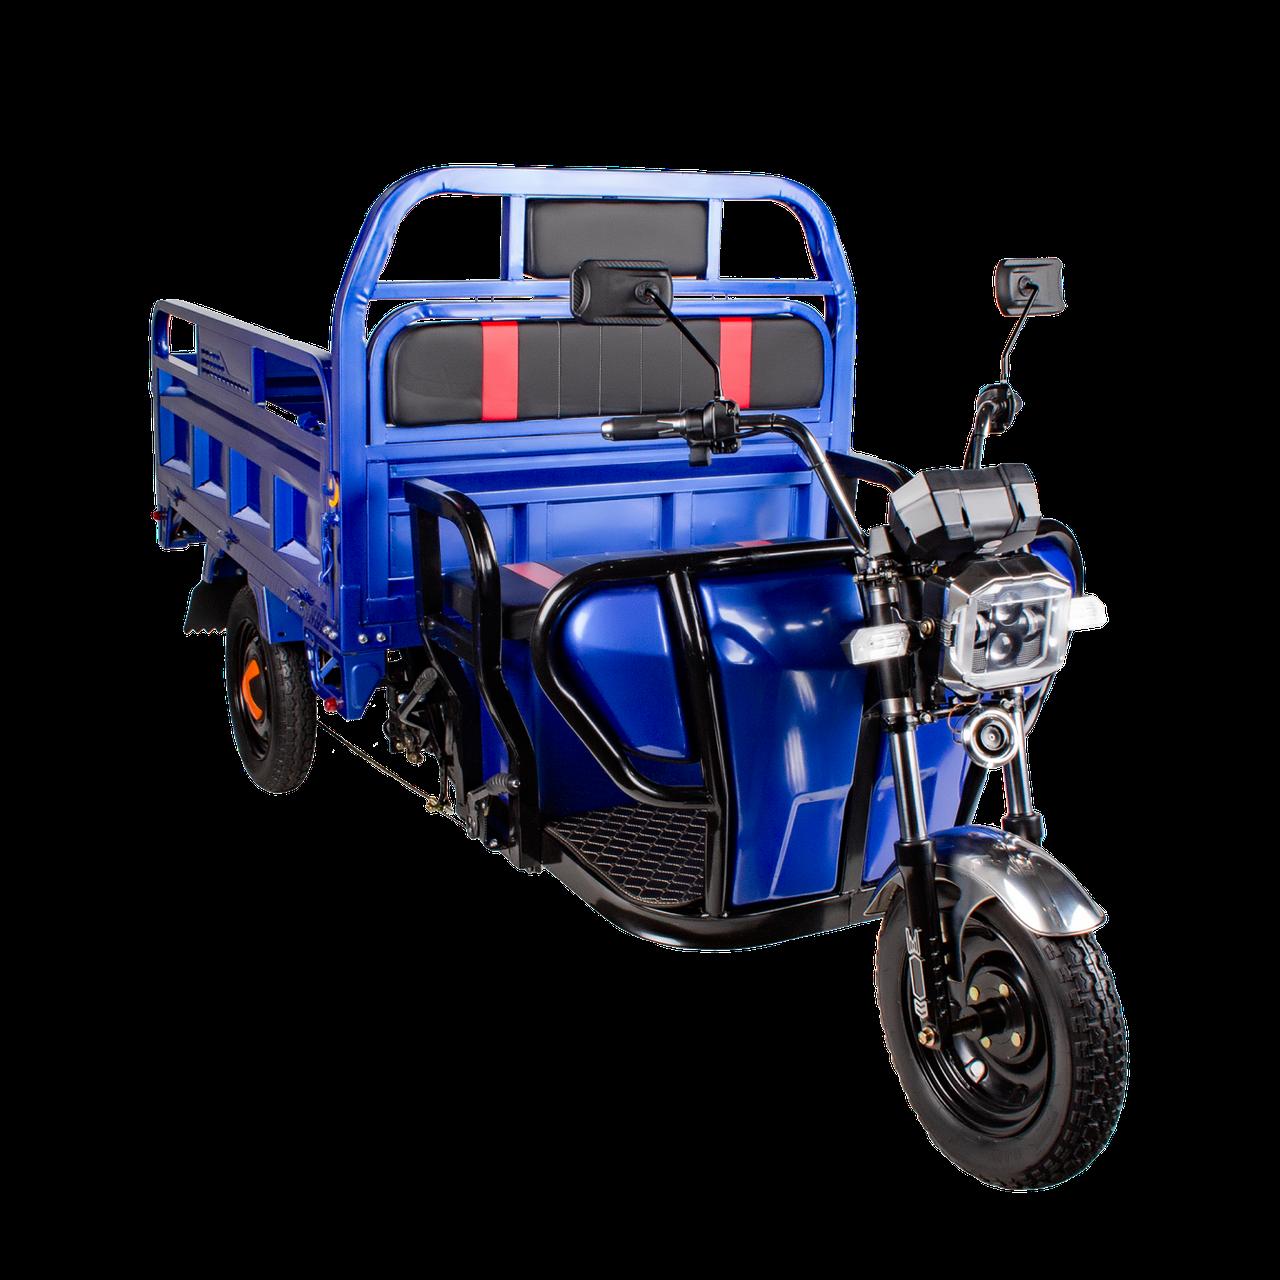 Электрический мопед TRIGO JJ1.6  1000W/60V/35AH(DZM) (синий)